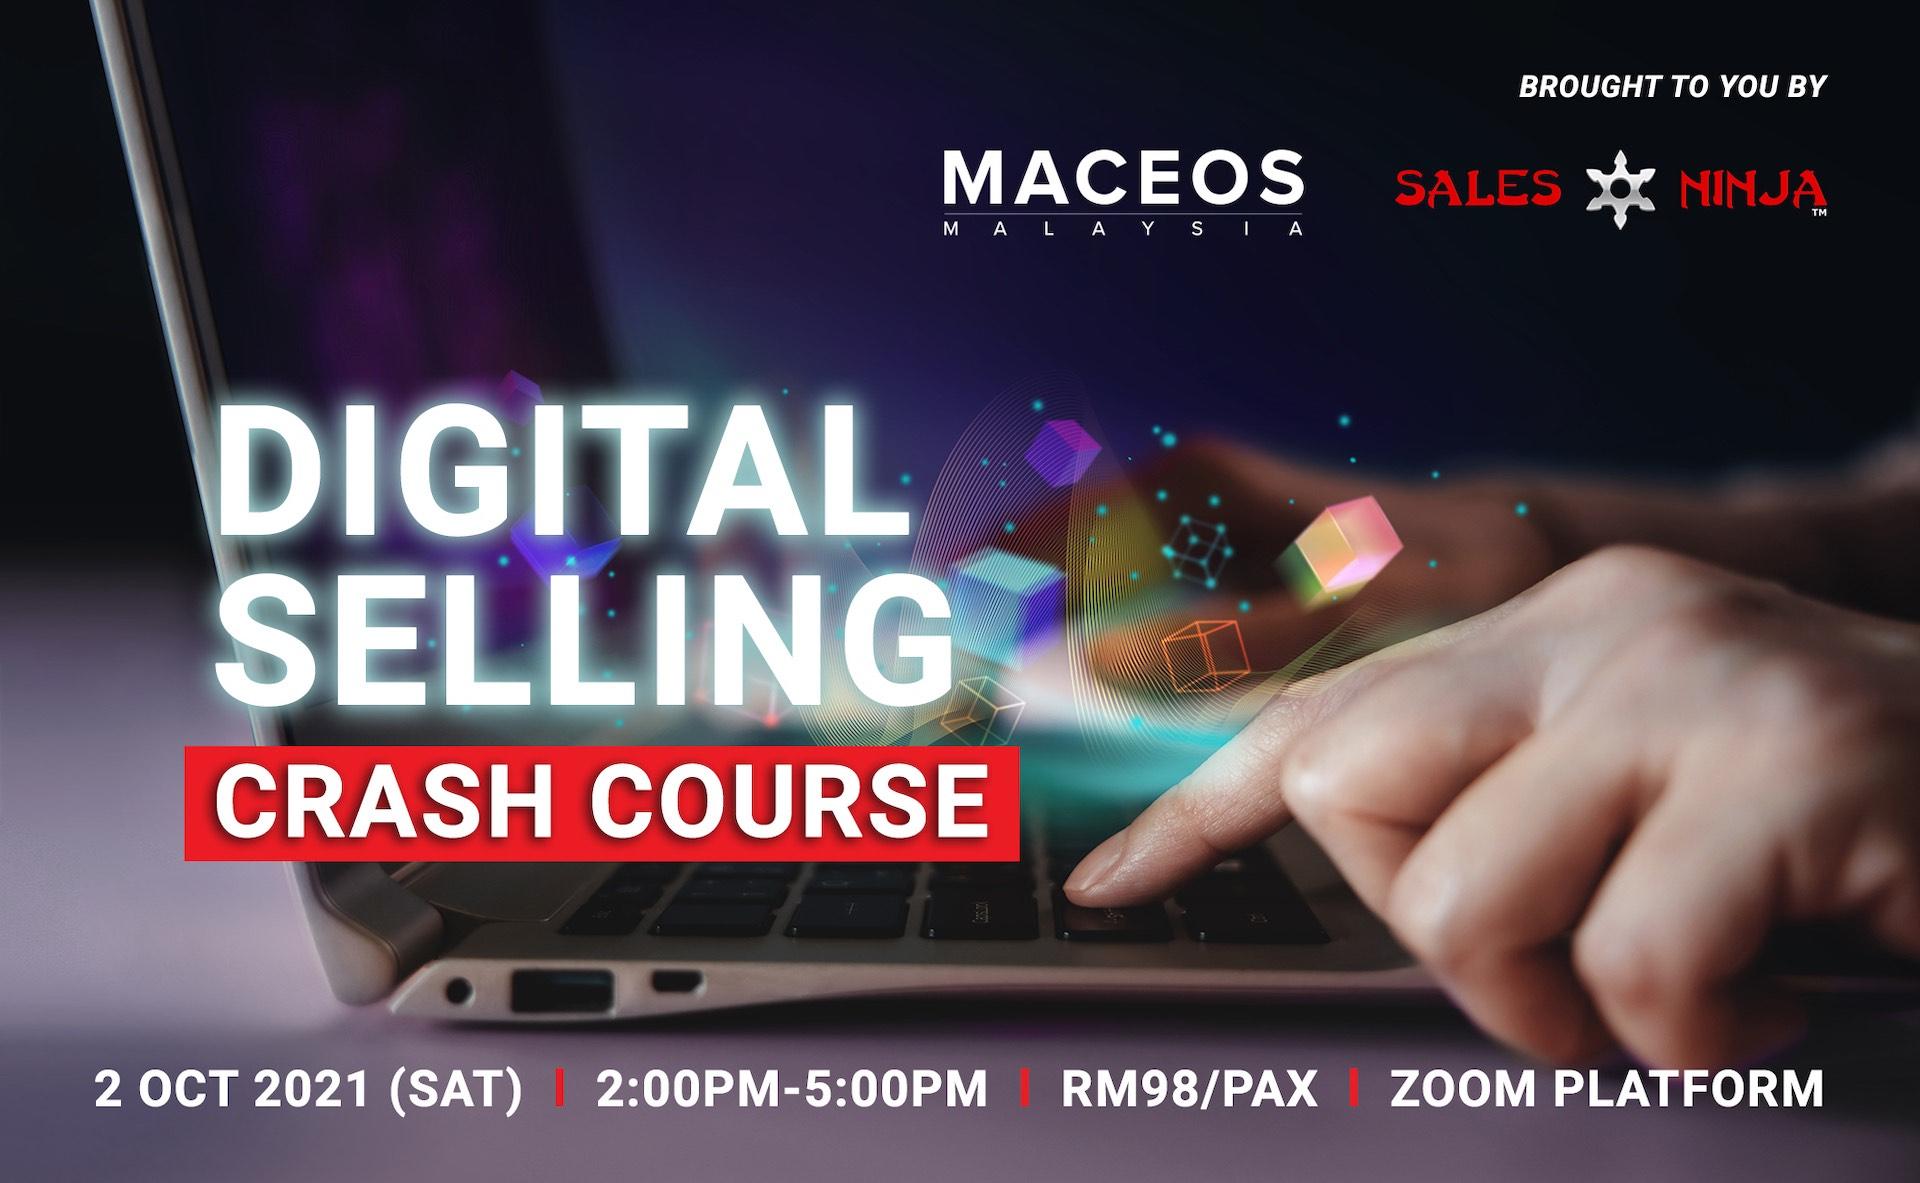 Digital Selling – Crash Course (2 Oct 2021, 2pm-5pm)